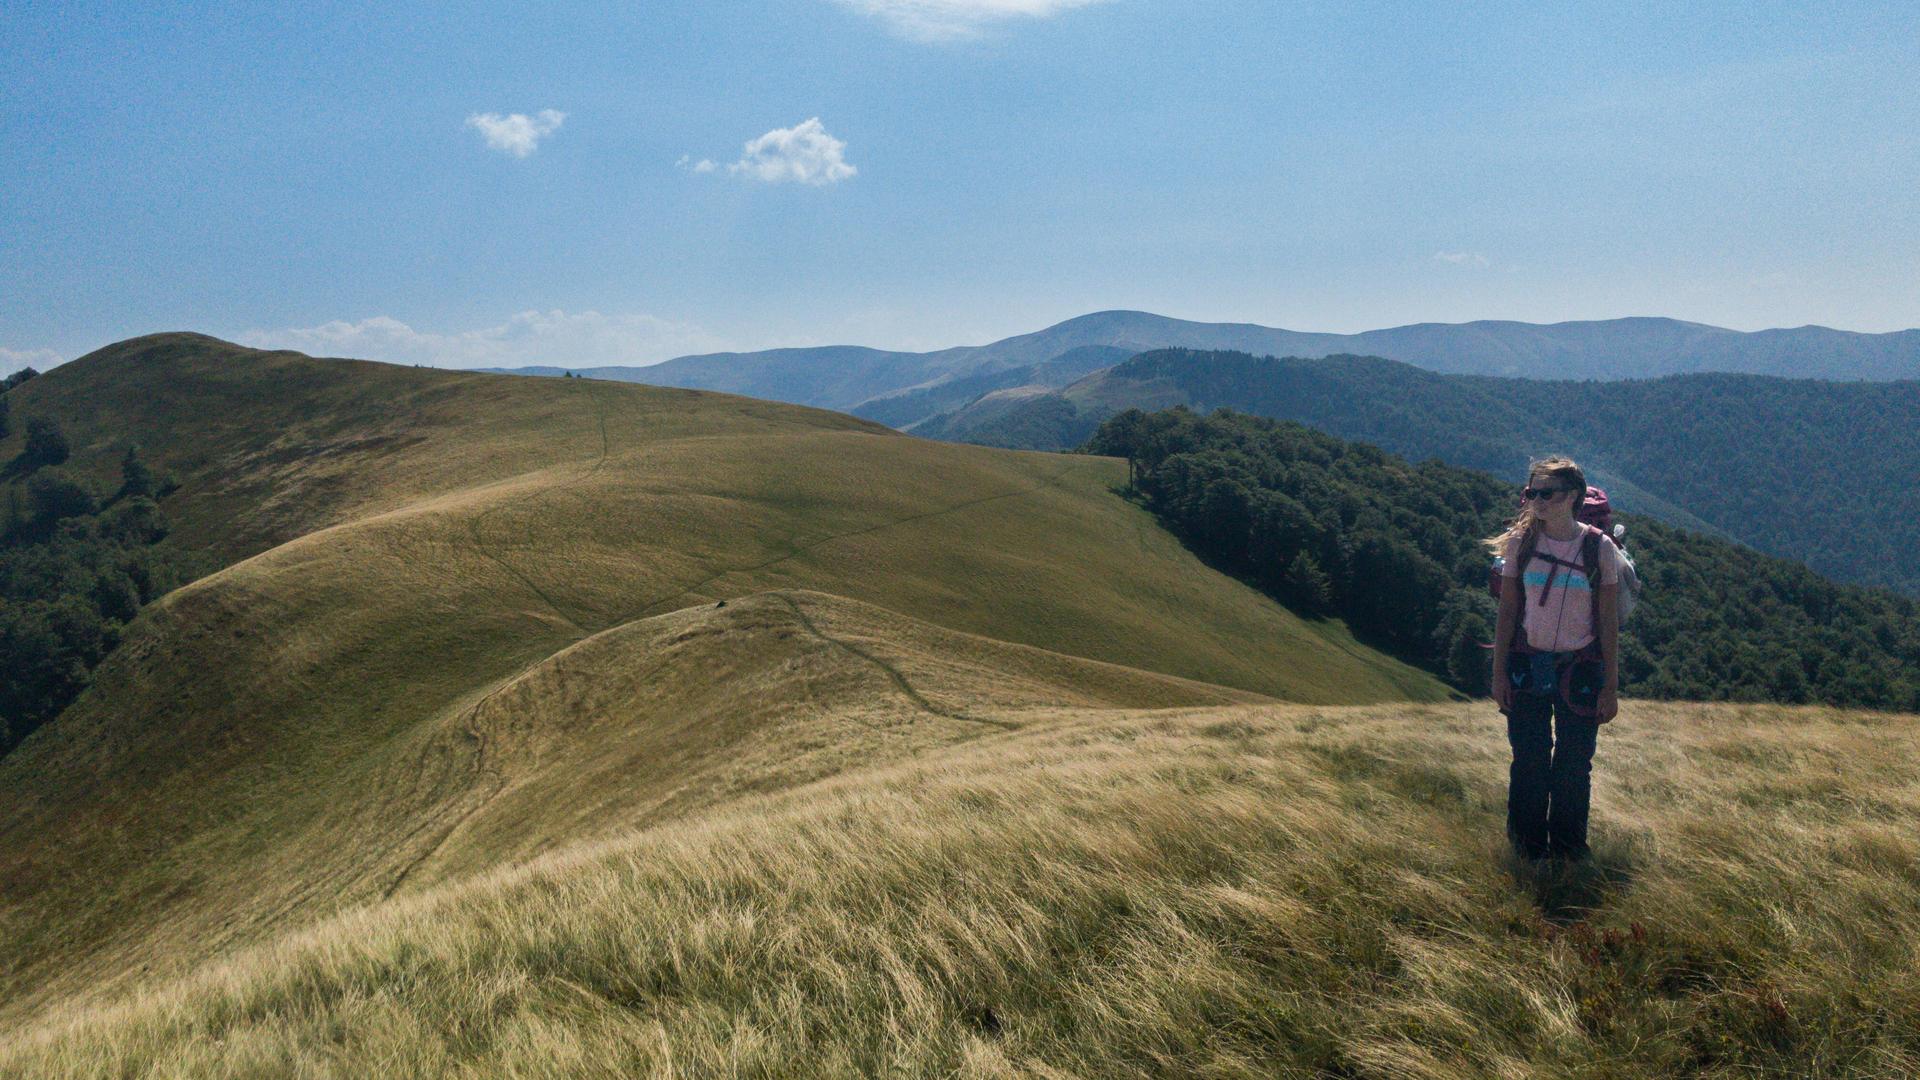 polonina svidovec, svidovec hike, trail svidovec, iphone carpathians, svidovec carpathians